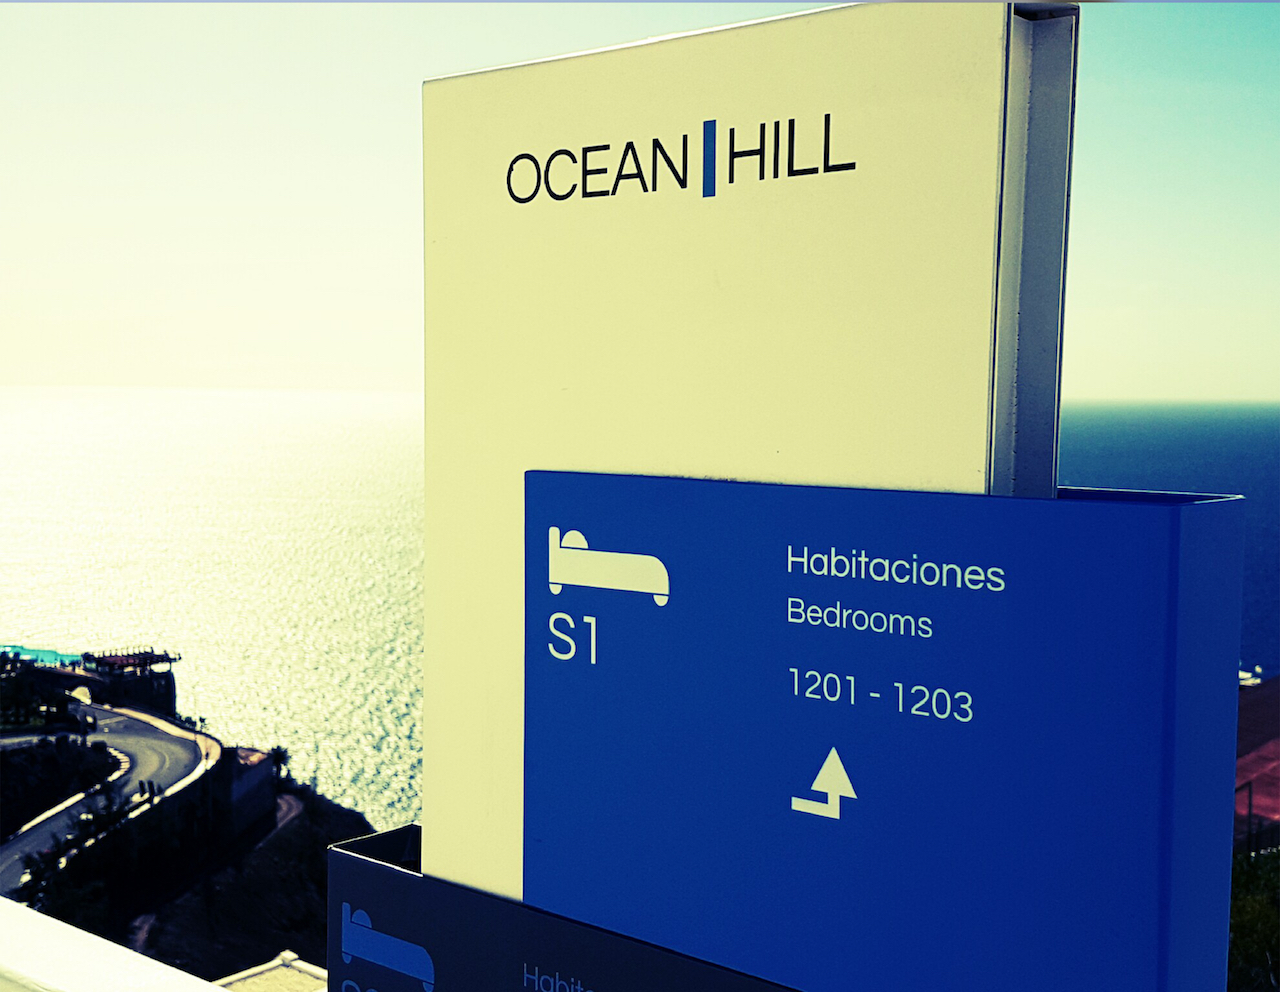 Directorio direccional, Ocean Hill, Maspaloma Gran Canaria